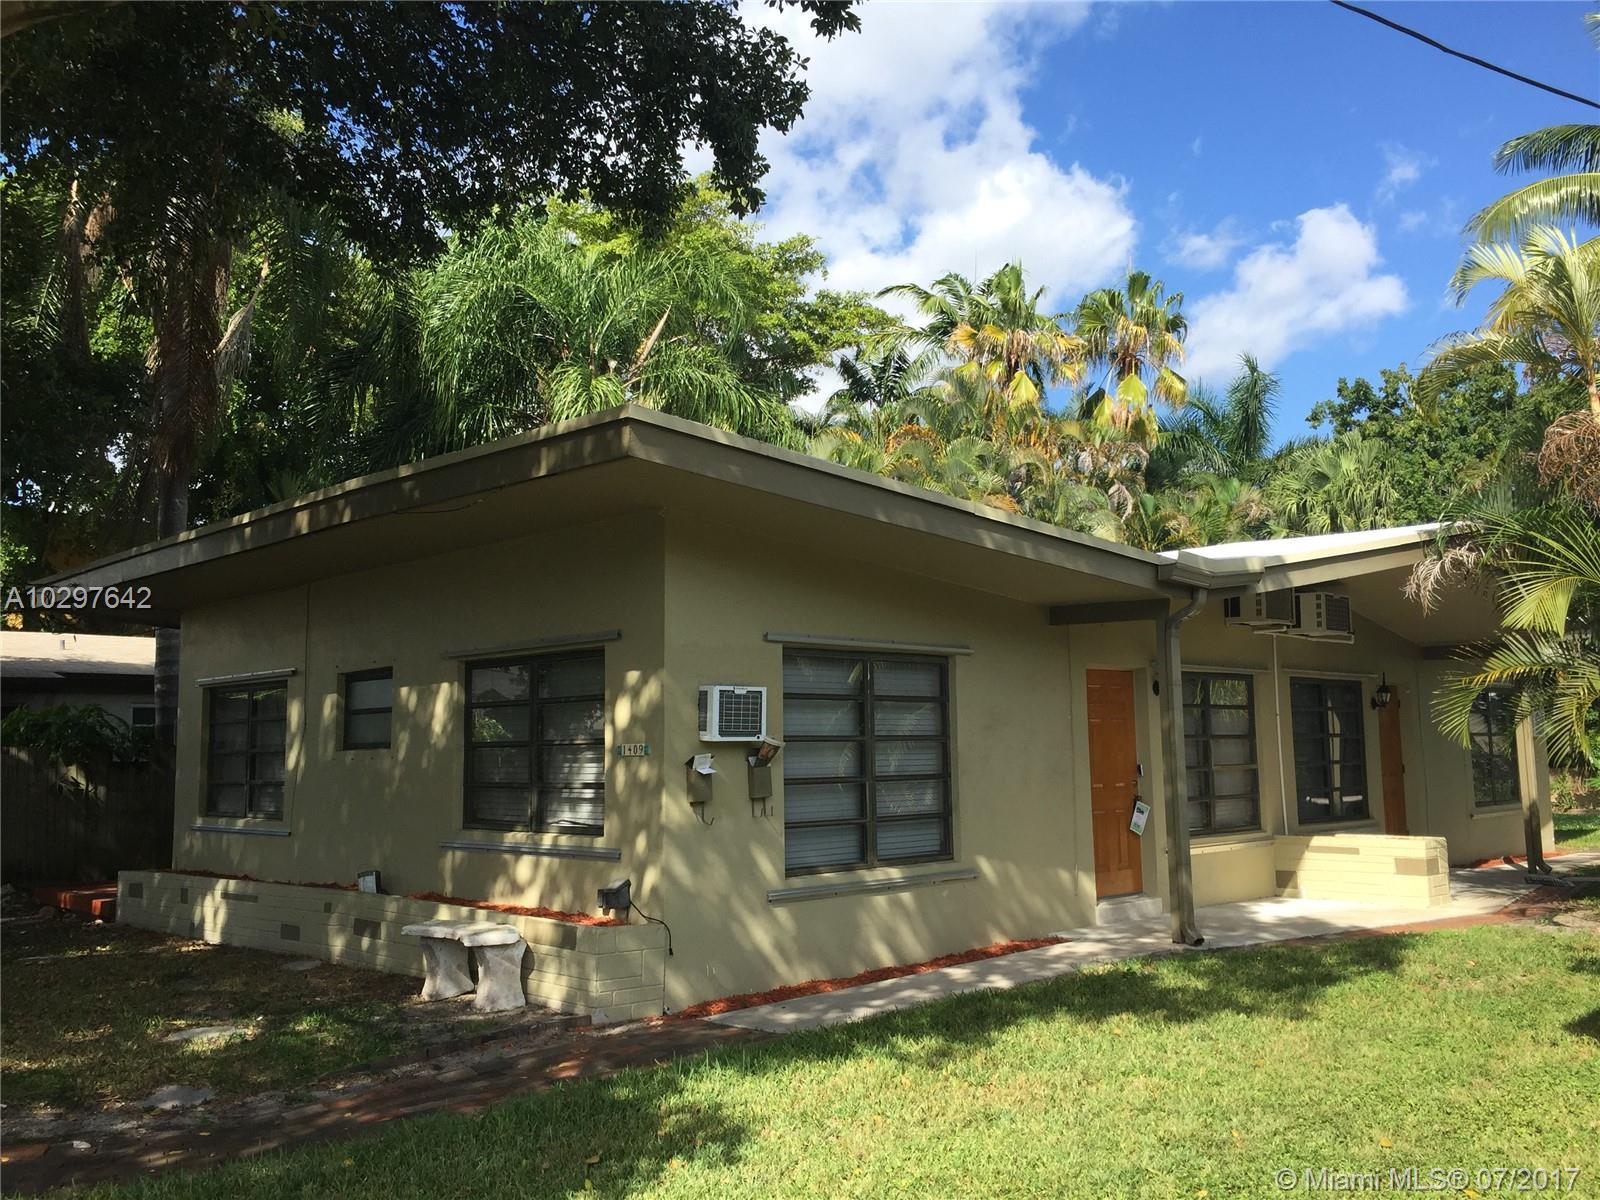 1409 NE 17th St # 1-2, Fort Lauderdale, FL 33305